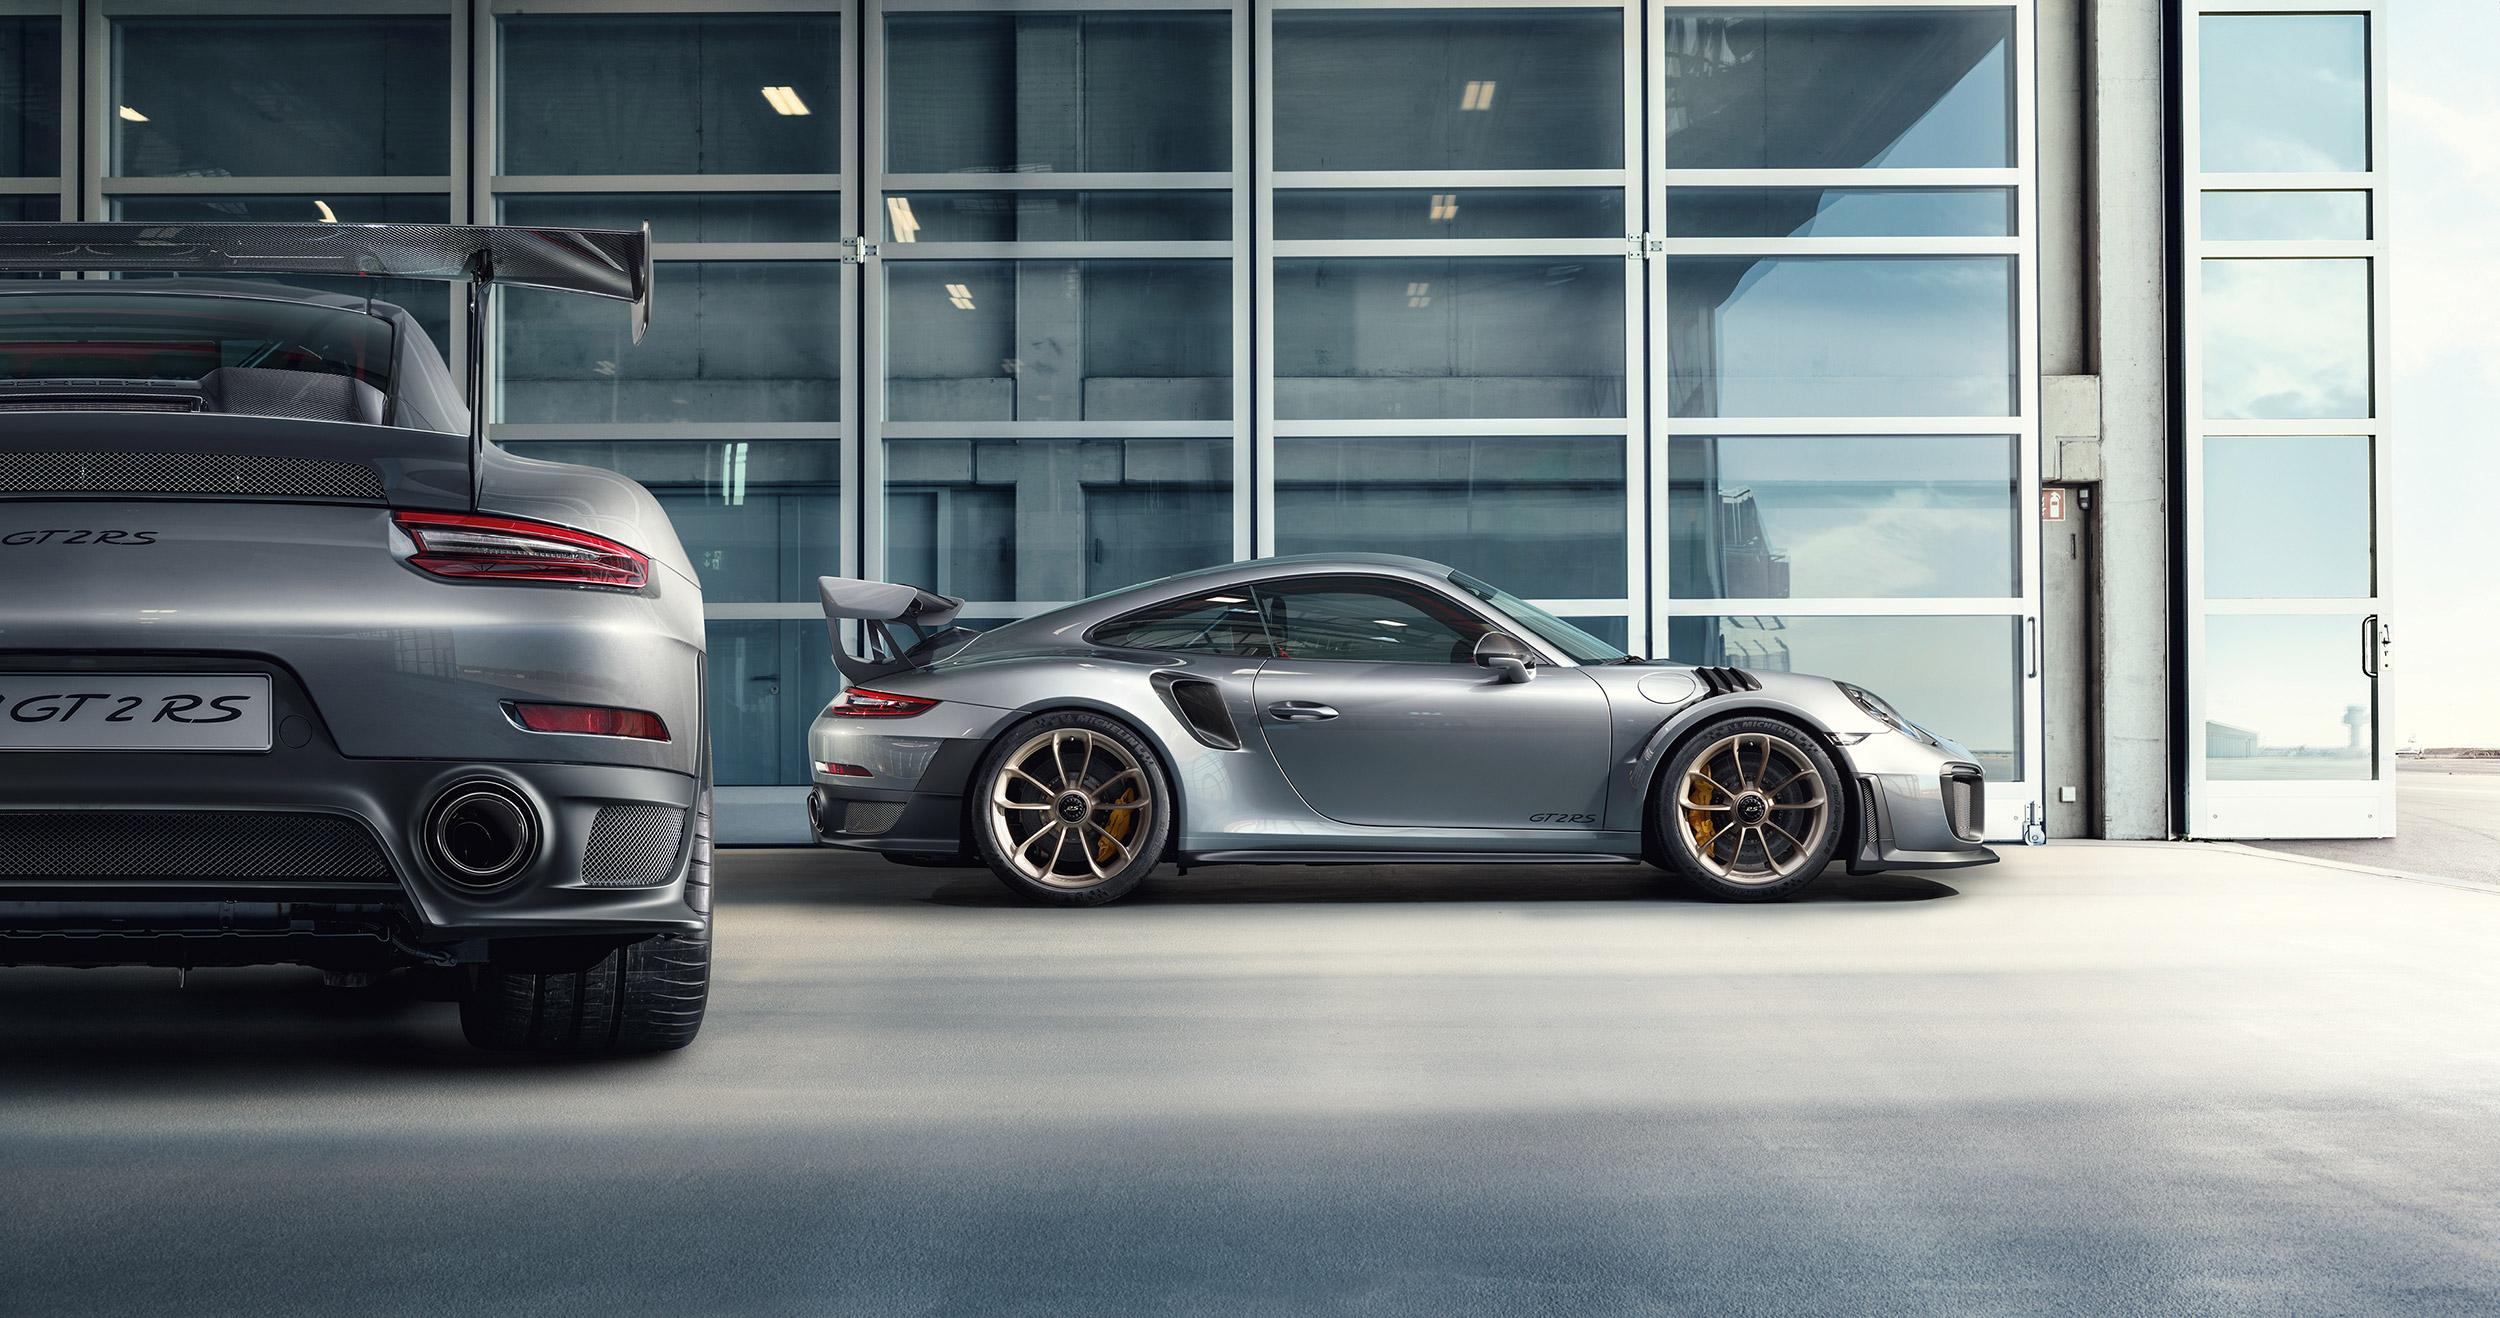 GT2_RS_profil_heck_2500 Stunning Porsche 911 Gt2 Rs Vs Lamborghini Aventador Cars Trend